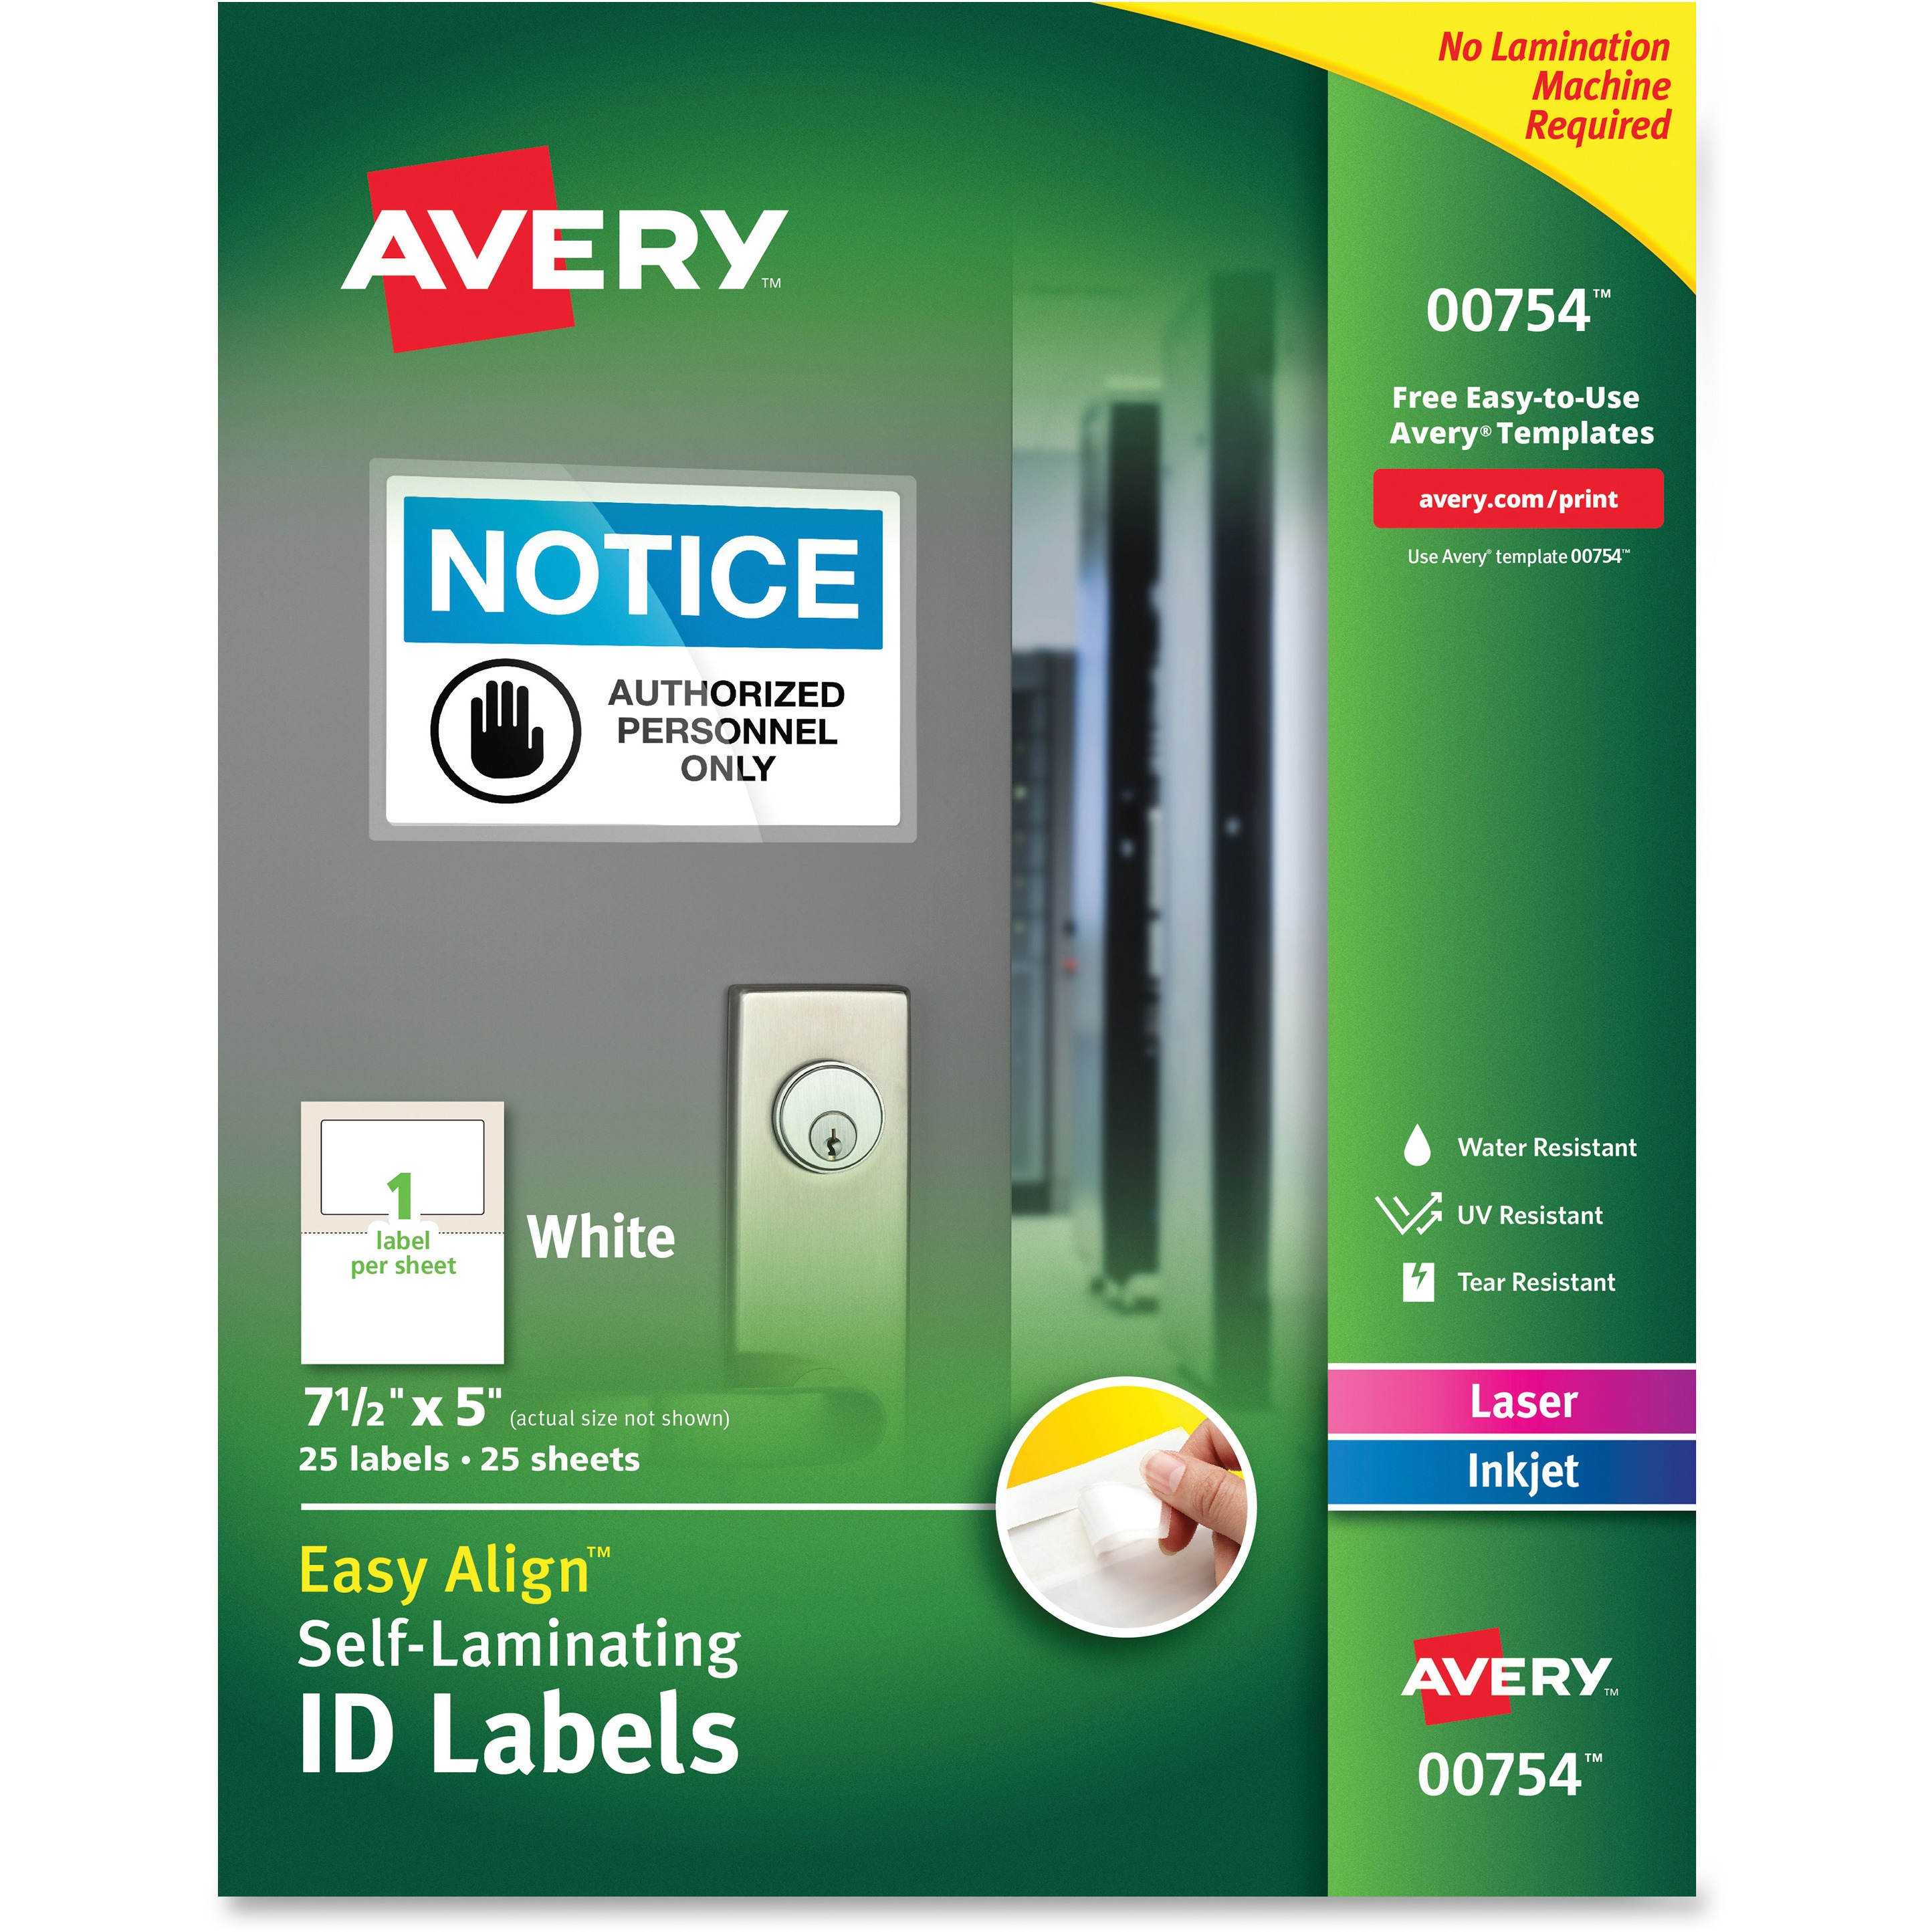 Avery Easy Align Self-Laminating ID Labels, Laser/Inkjet, 5 x 7 1/2, White, 25/PK